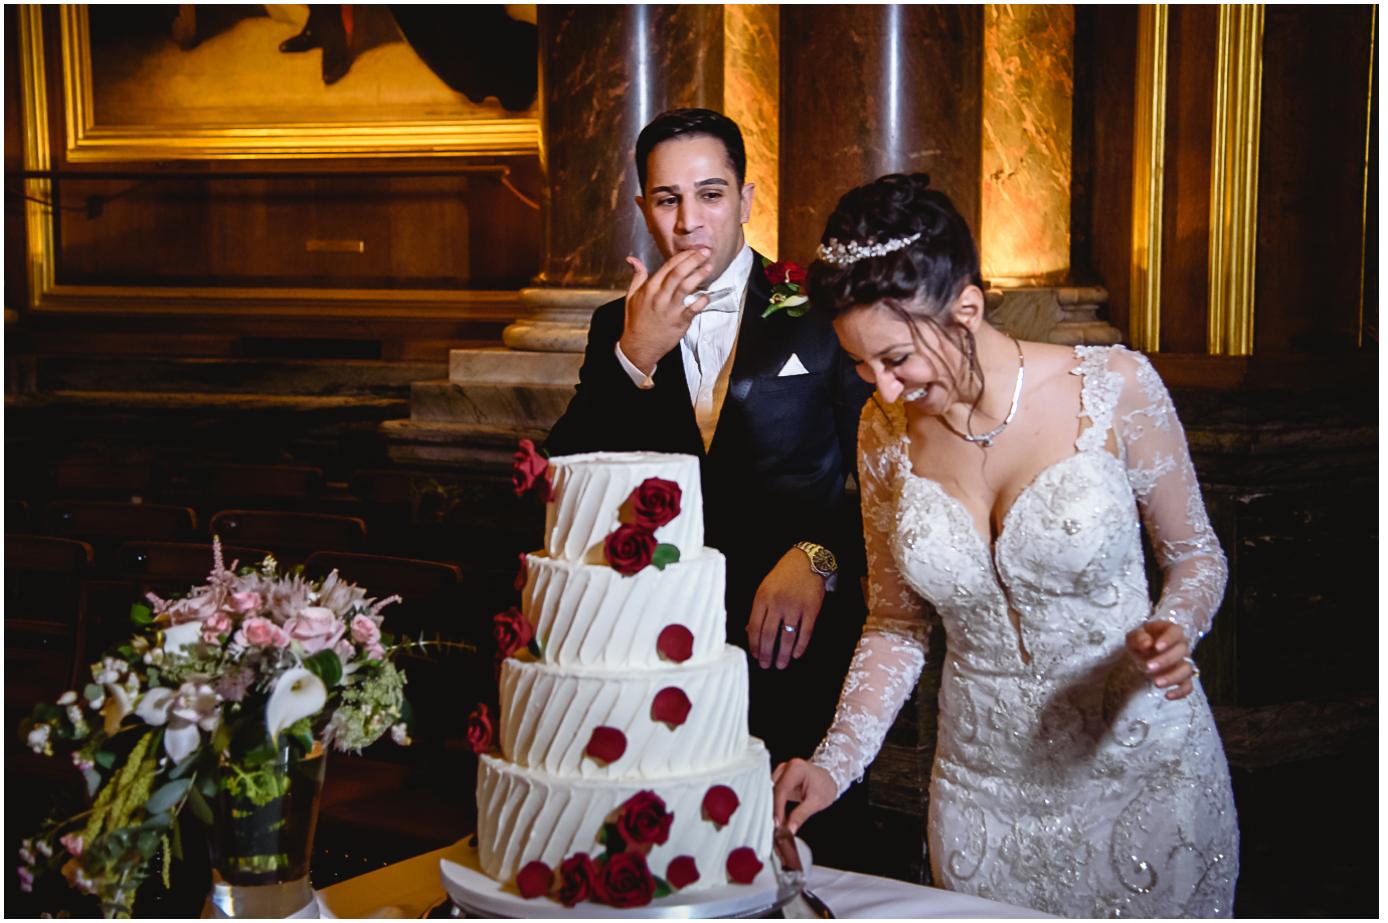 iranian wedding photographer 212 - Drapers Hall London Wedding Photographer